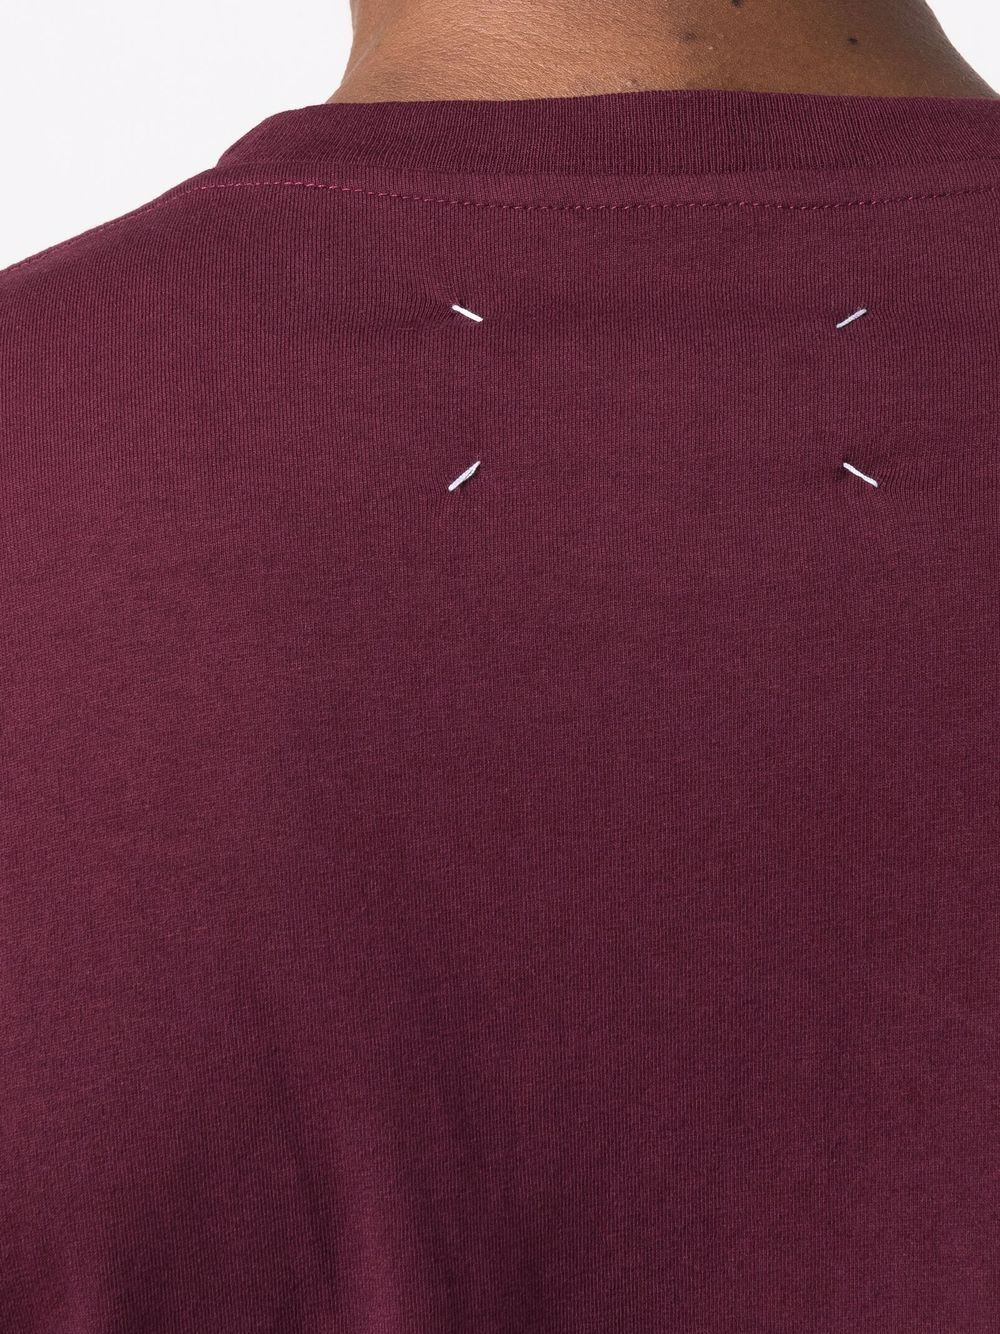 tripack di t-shirt uomo multicolore in cotone MAISON MARGIELA   T-shirt   S50GC0652 S23973962